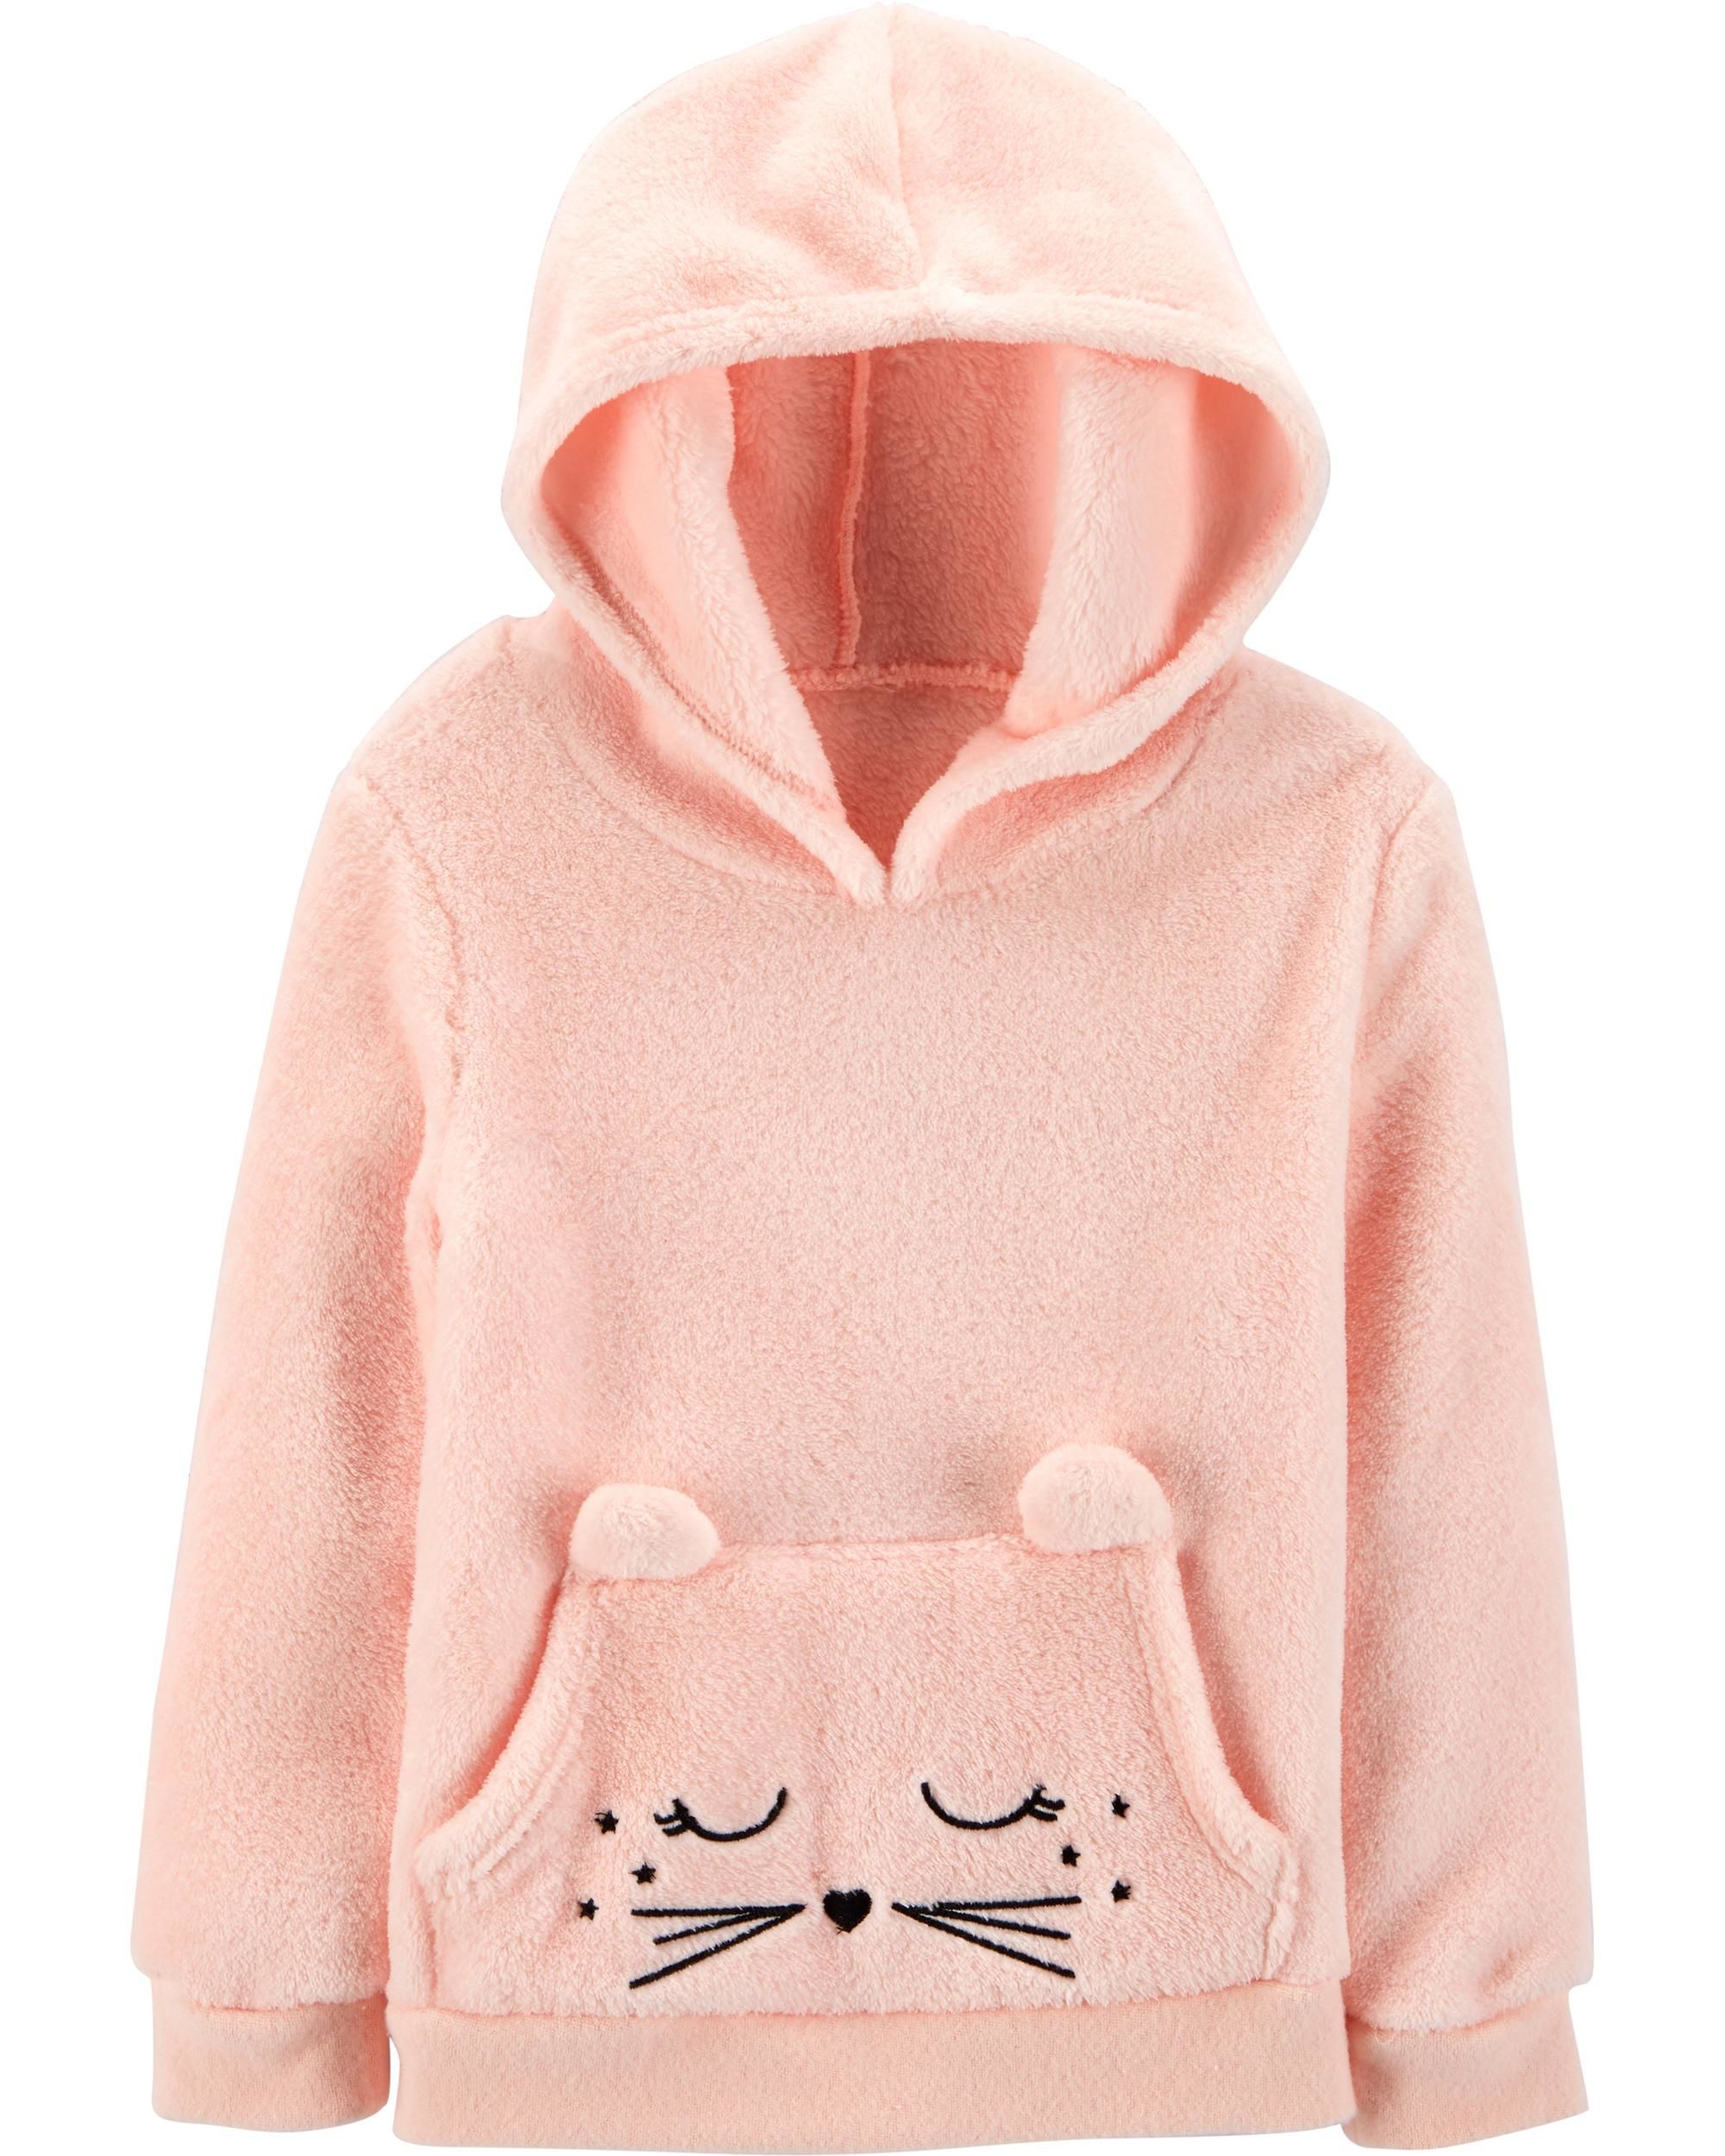 Youth//Kid Hooded Mermaid Cat Sweatshirt Fleece Pullover Hood